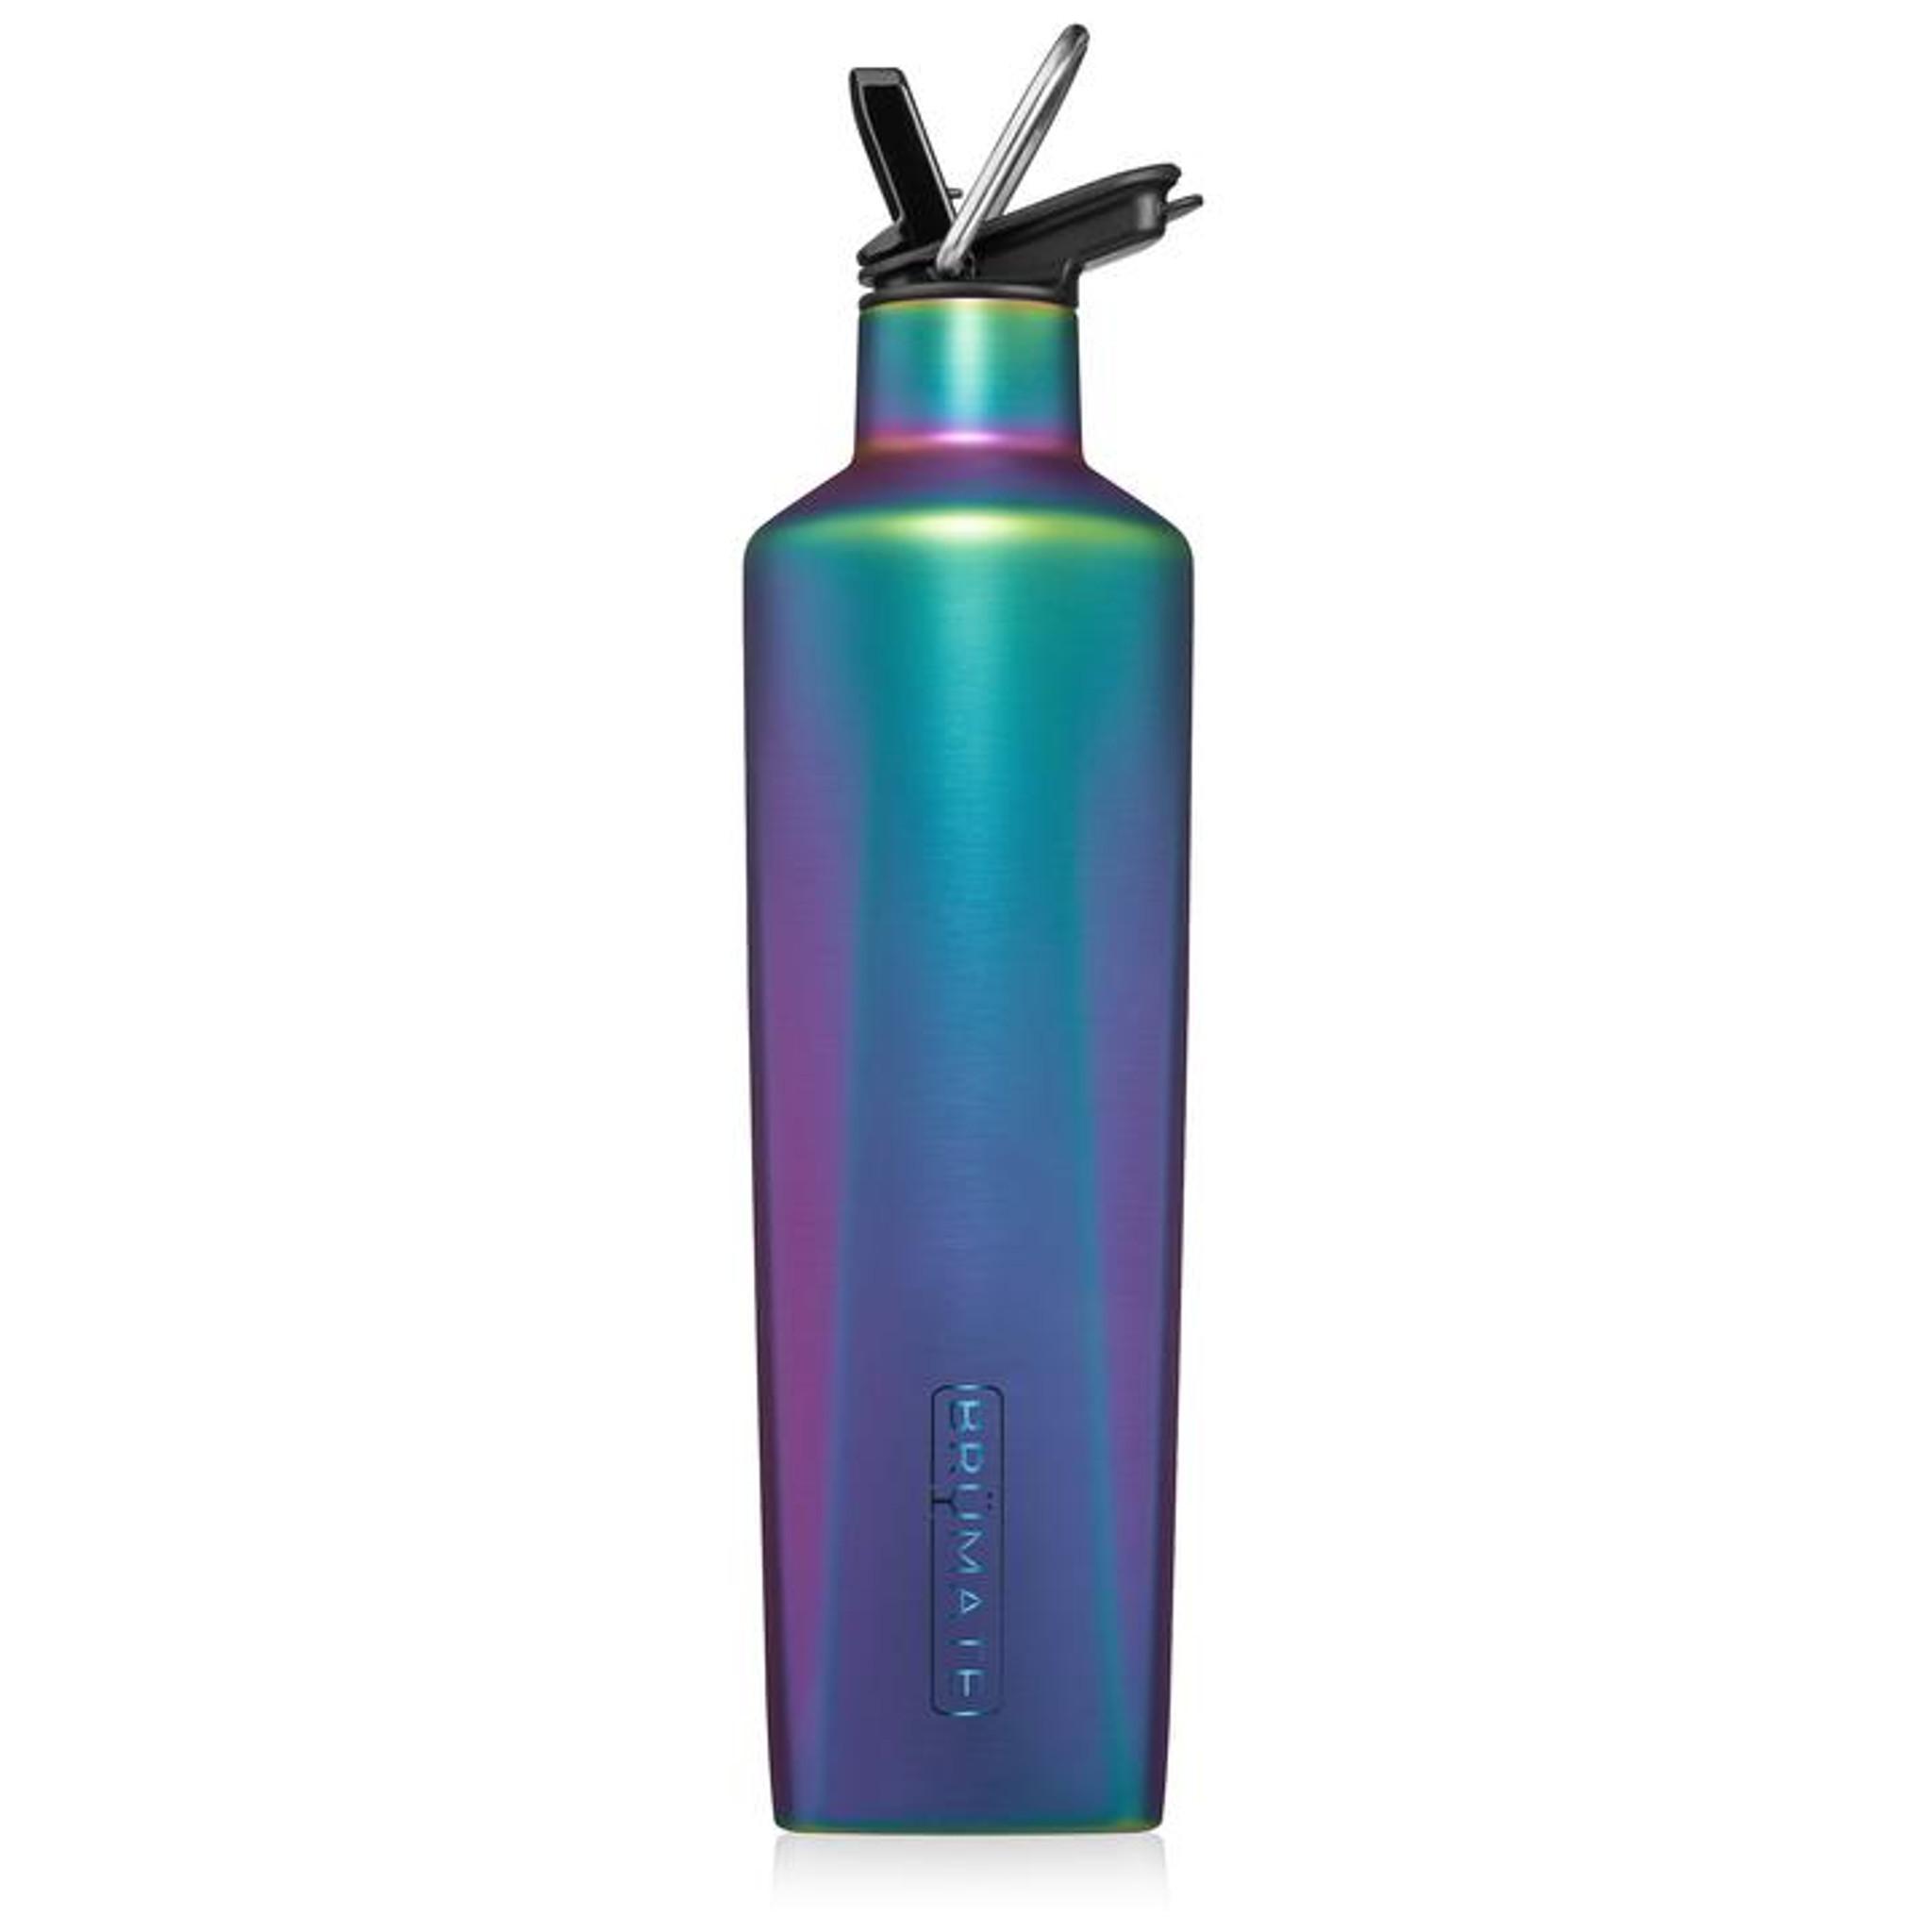 Brumate Rehydration Bottle - Dark Aura